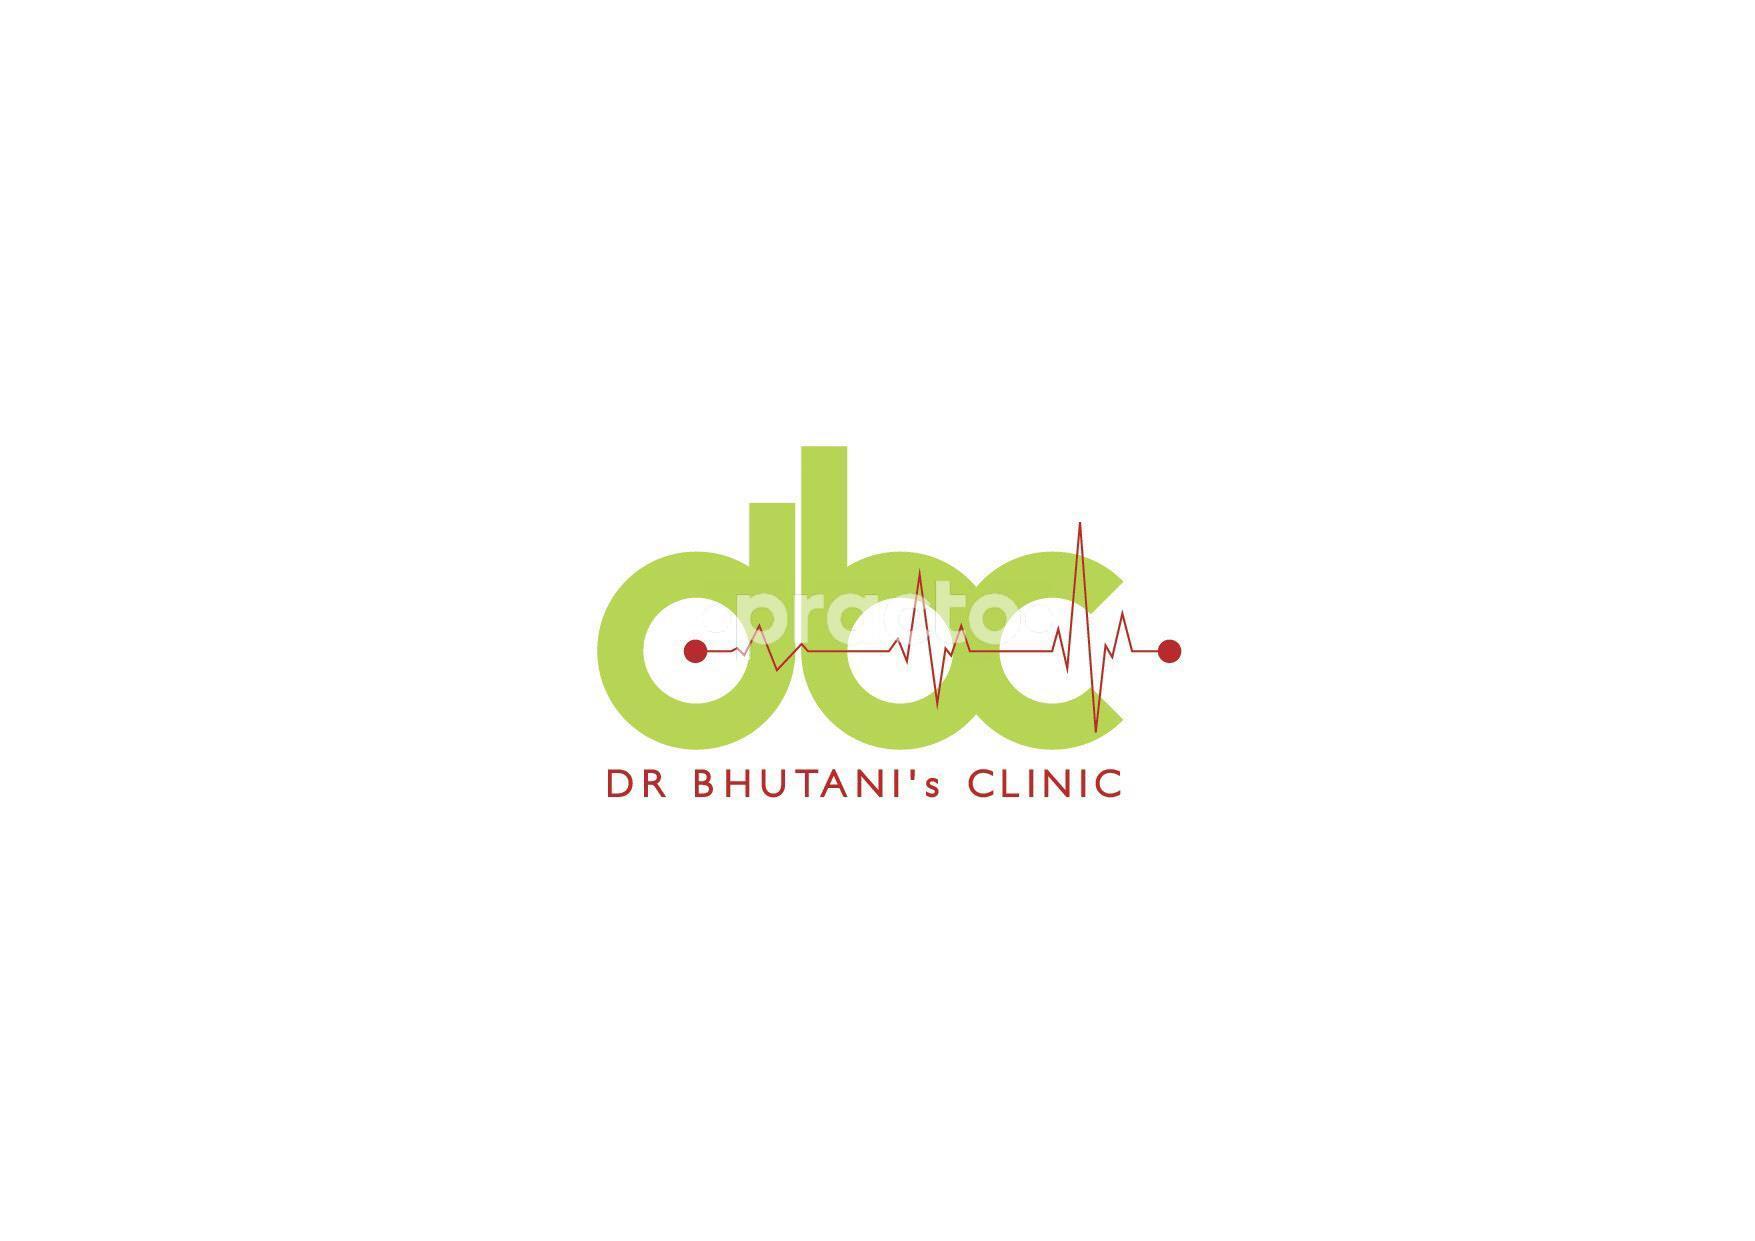 Dr. Bhutani's Clinic